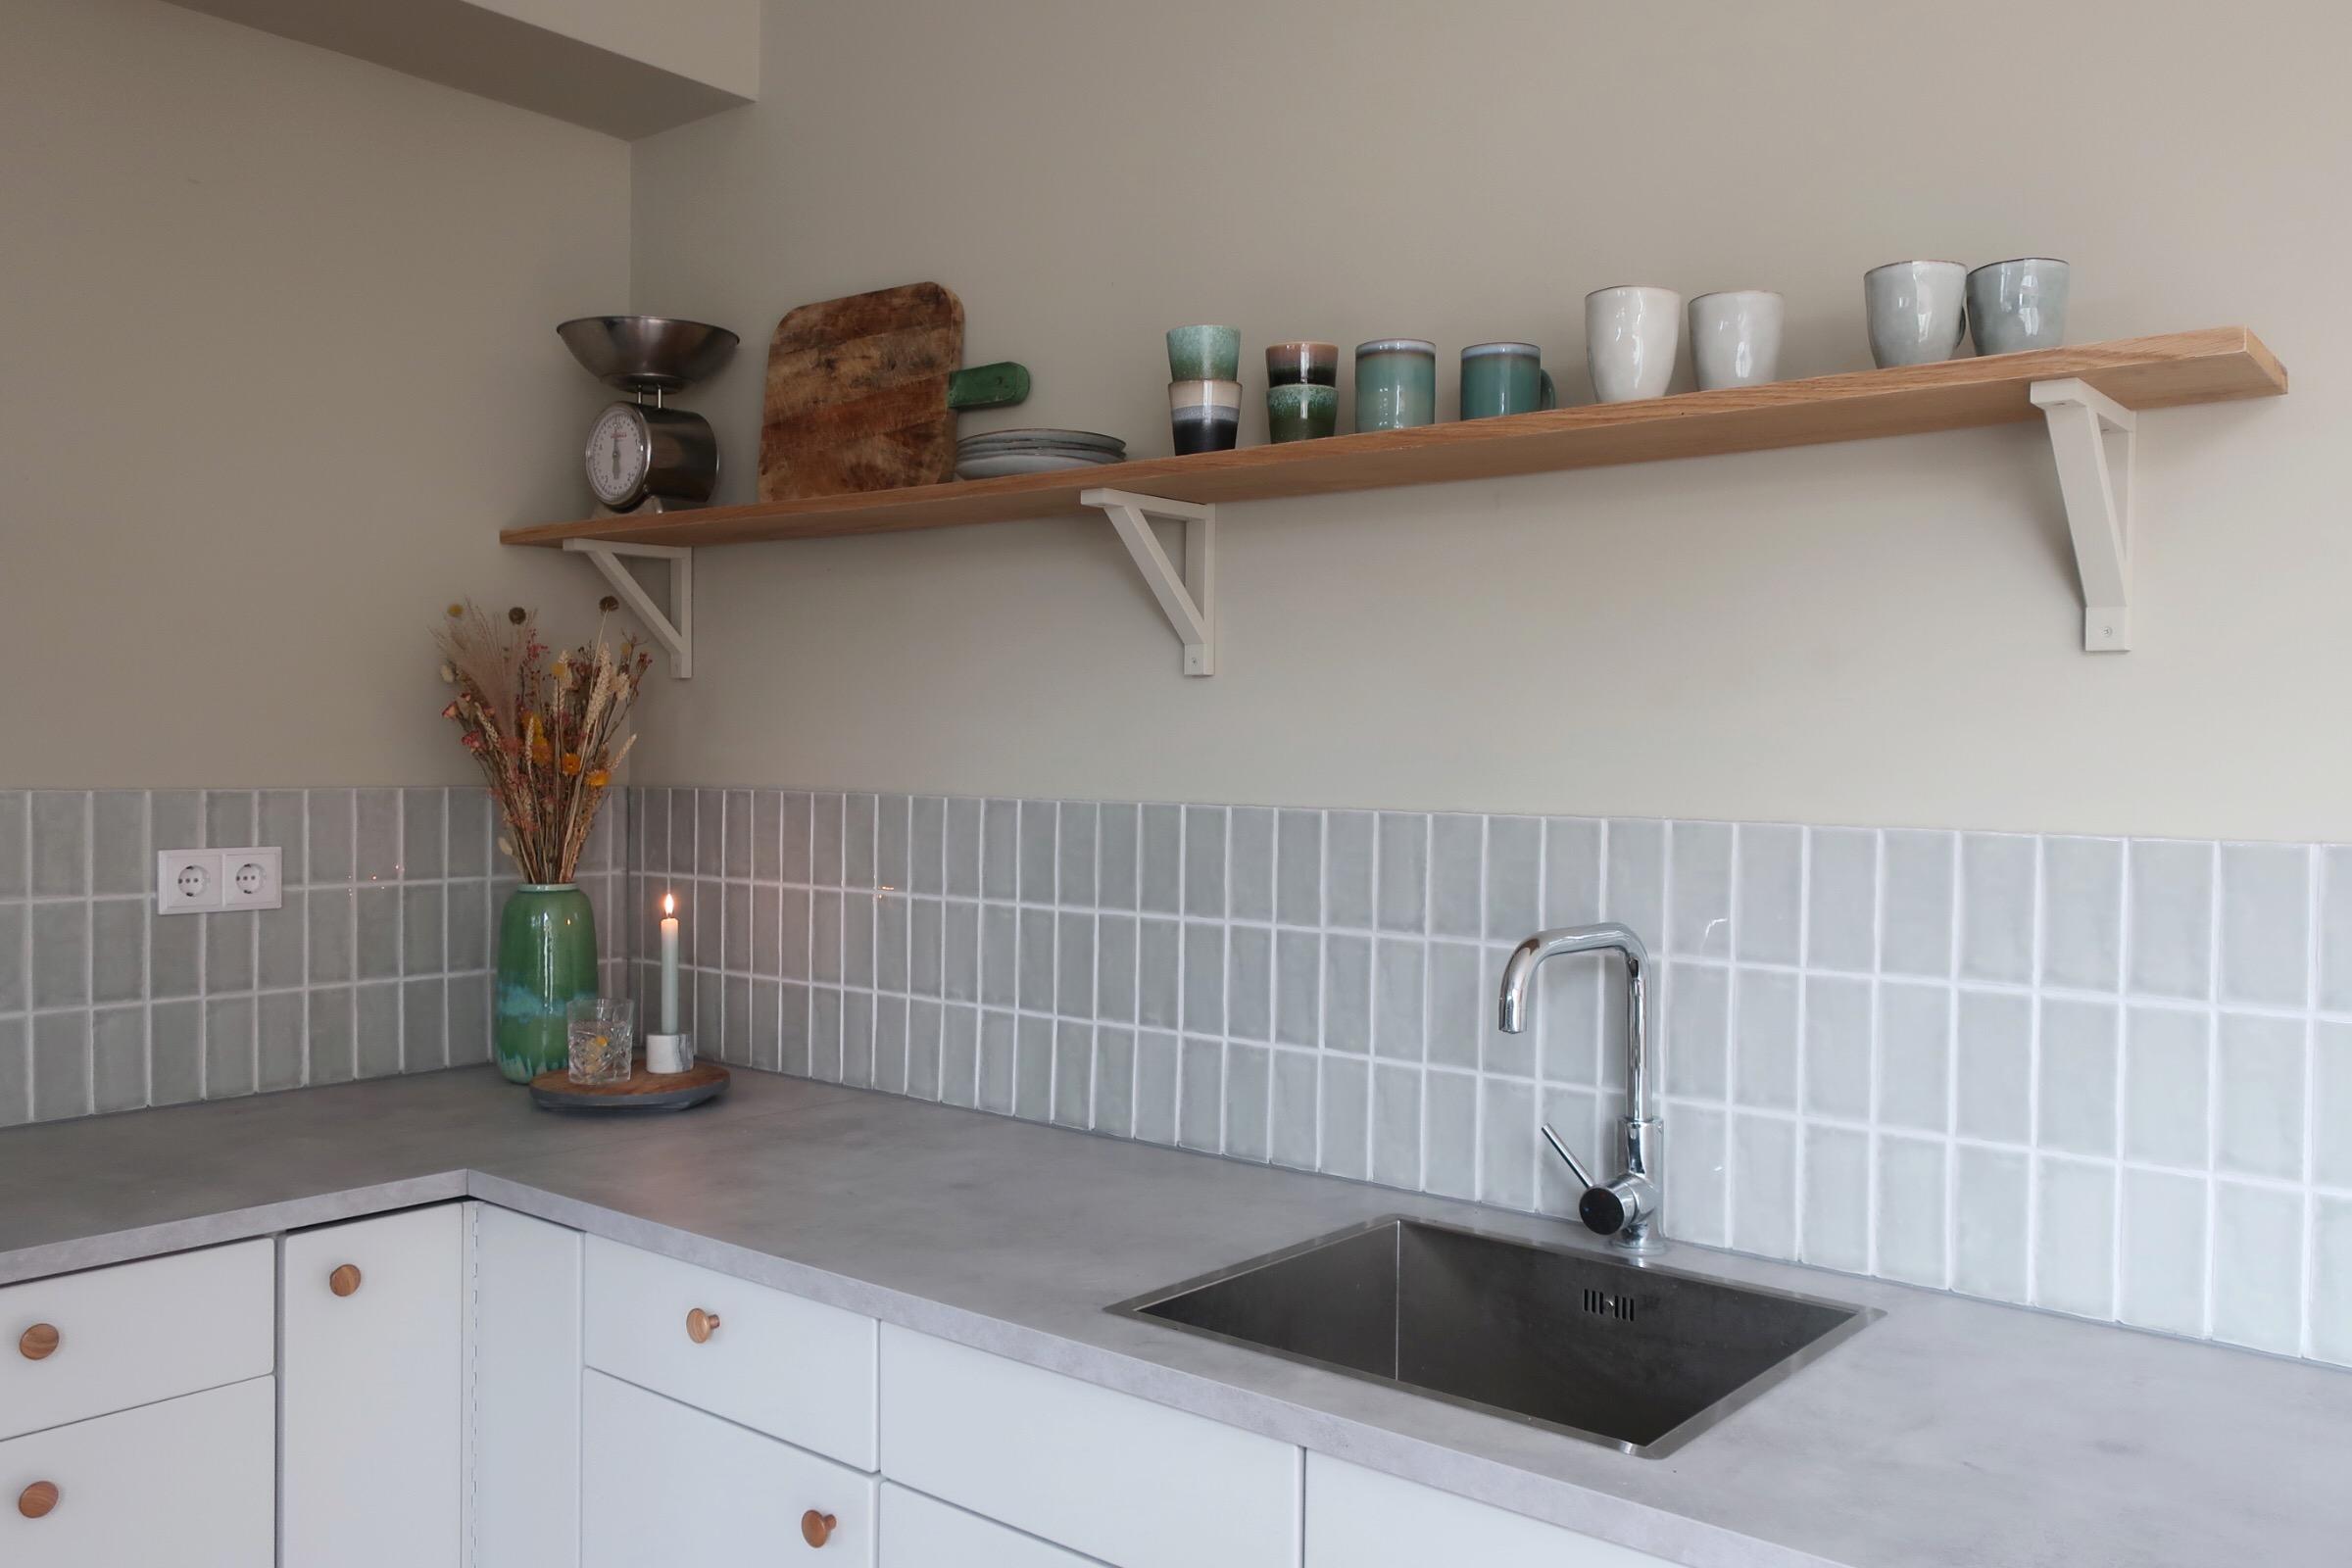 Designtegels achterwand keuken. Witte keuken met Spaanse tegeltjes Manual 6.5x15 Gris #designtegels #keuken #keukentegels #achterwand #spaansetegels #wittekeuken